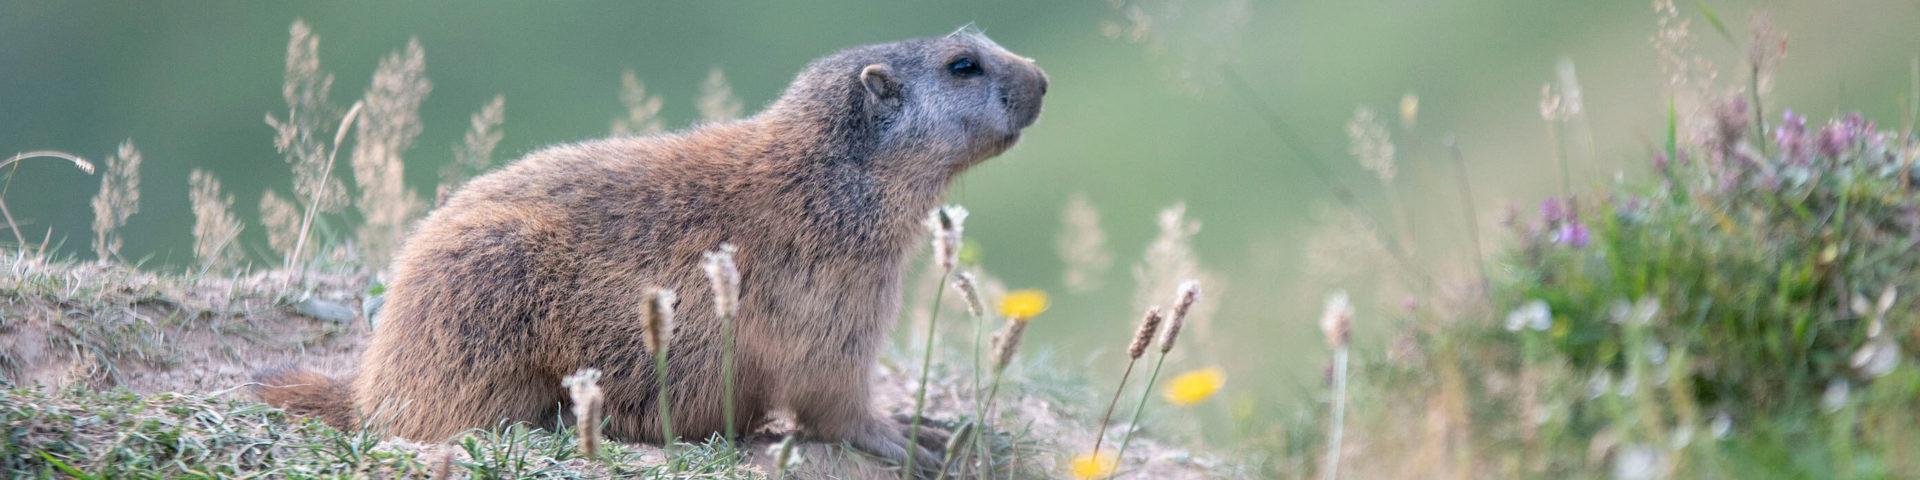 alpine marmots